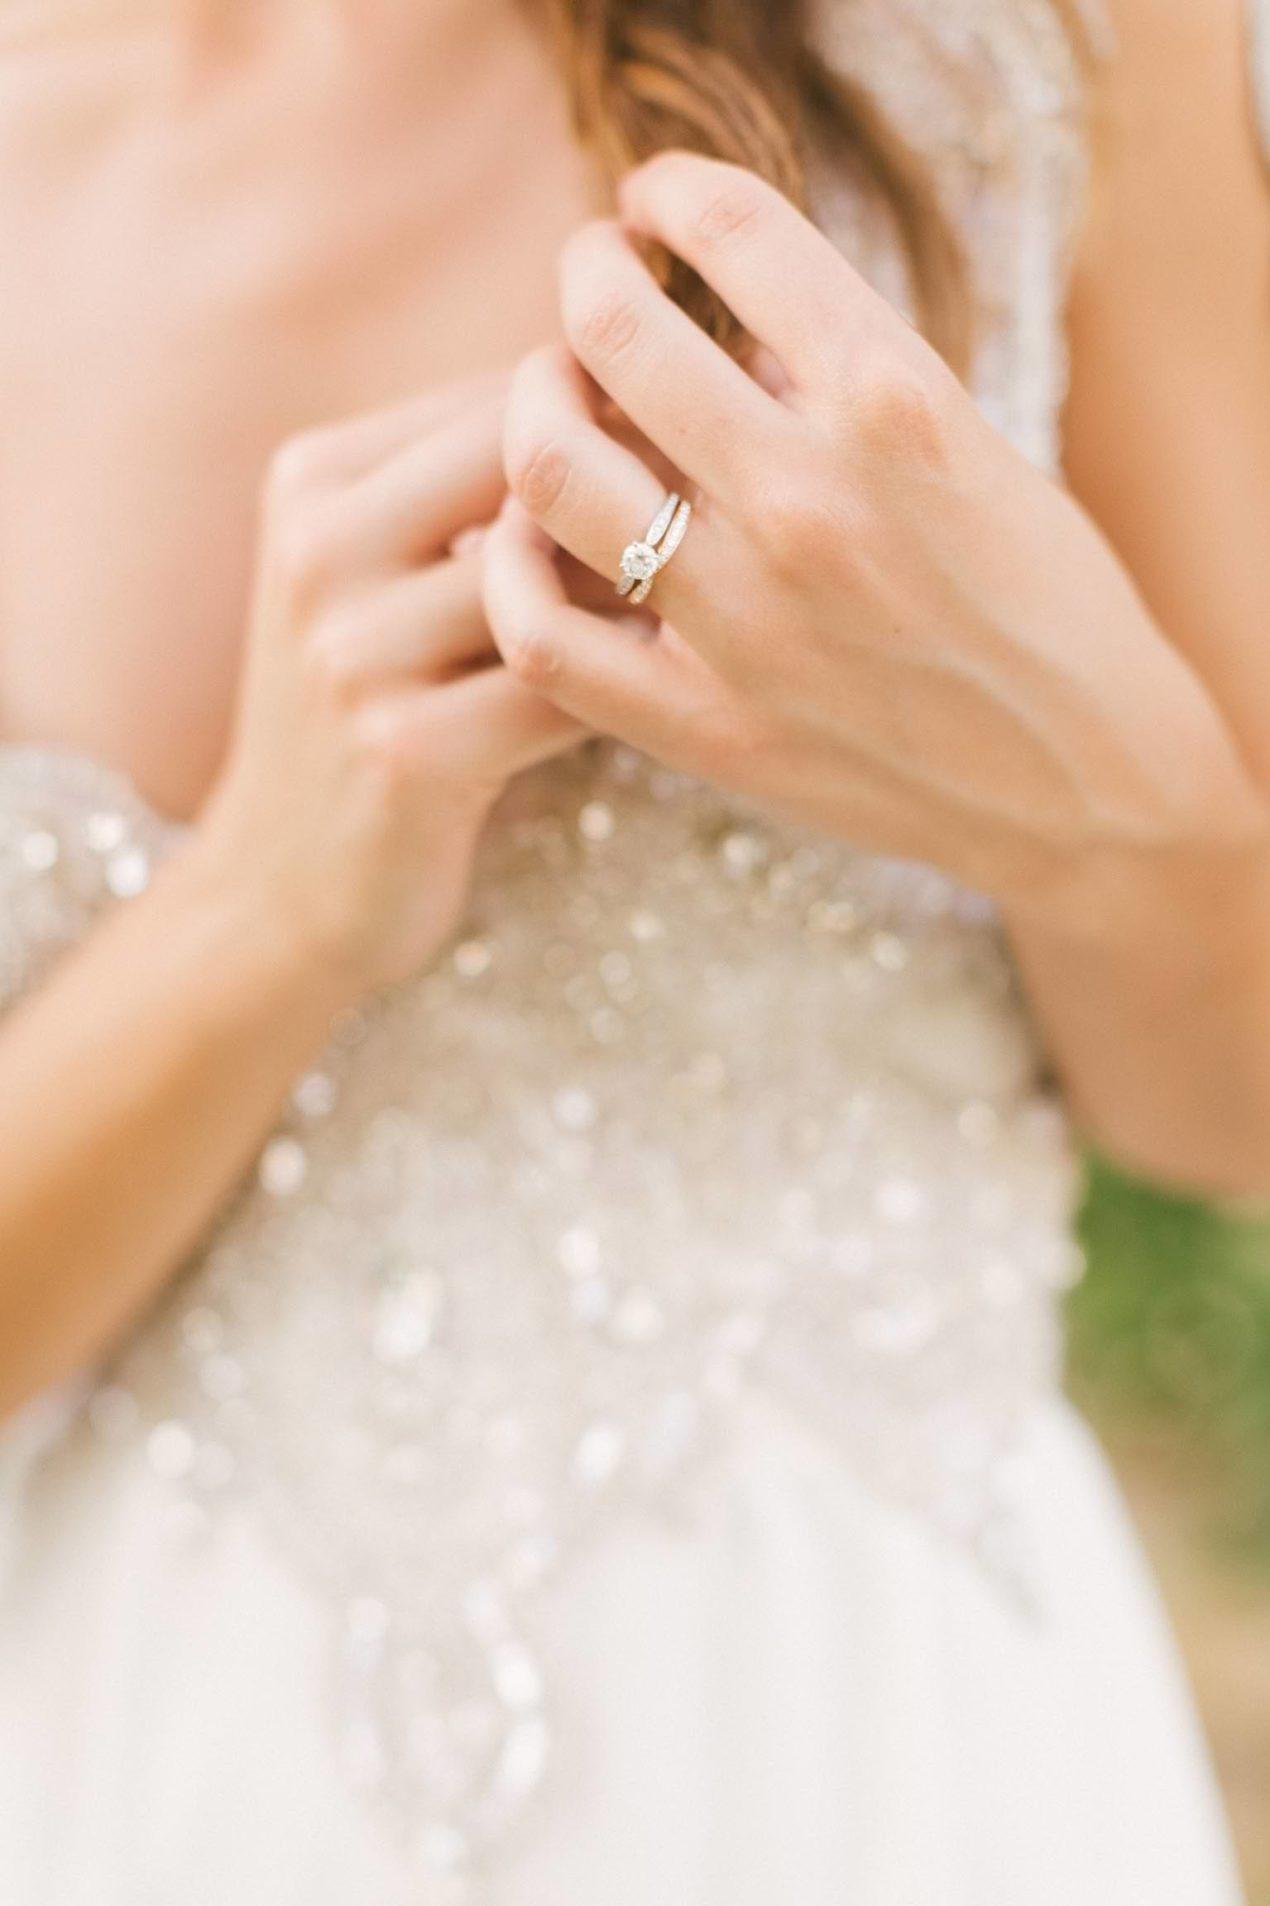 matrimonio-pienza-059-635x953@2x.jpg